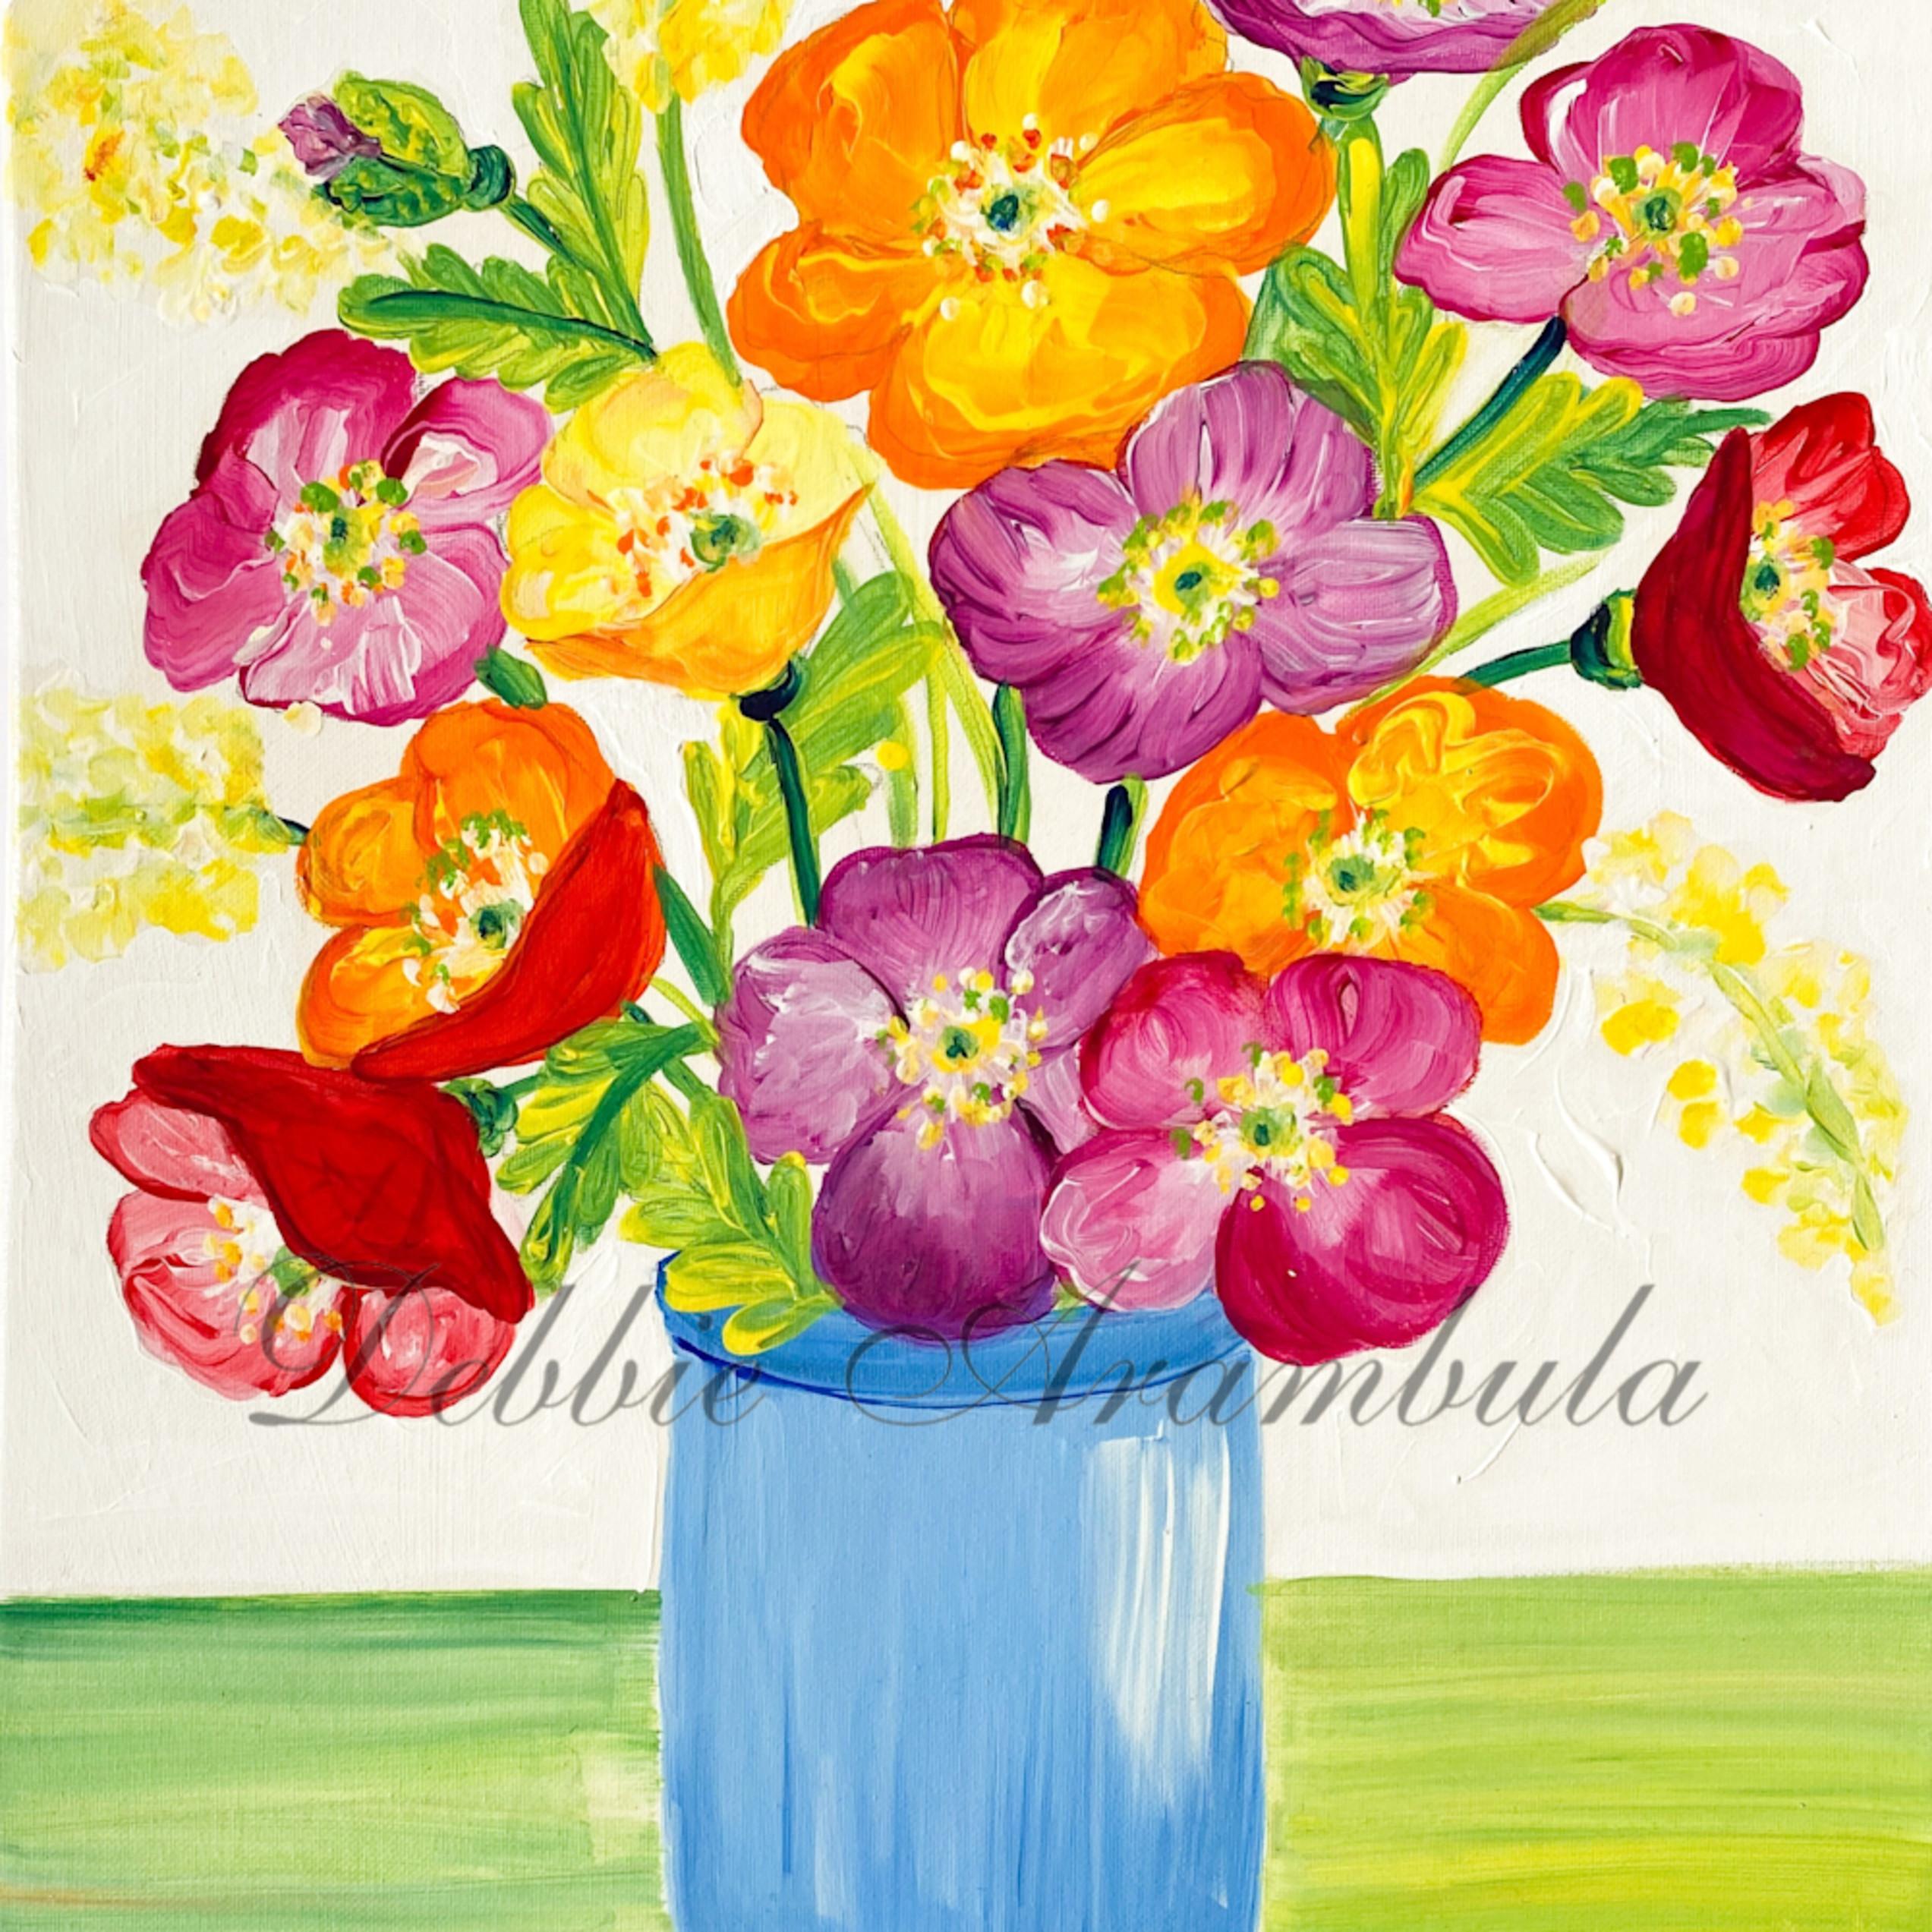 Bouquet of hope pjieqg